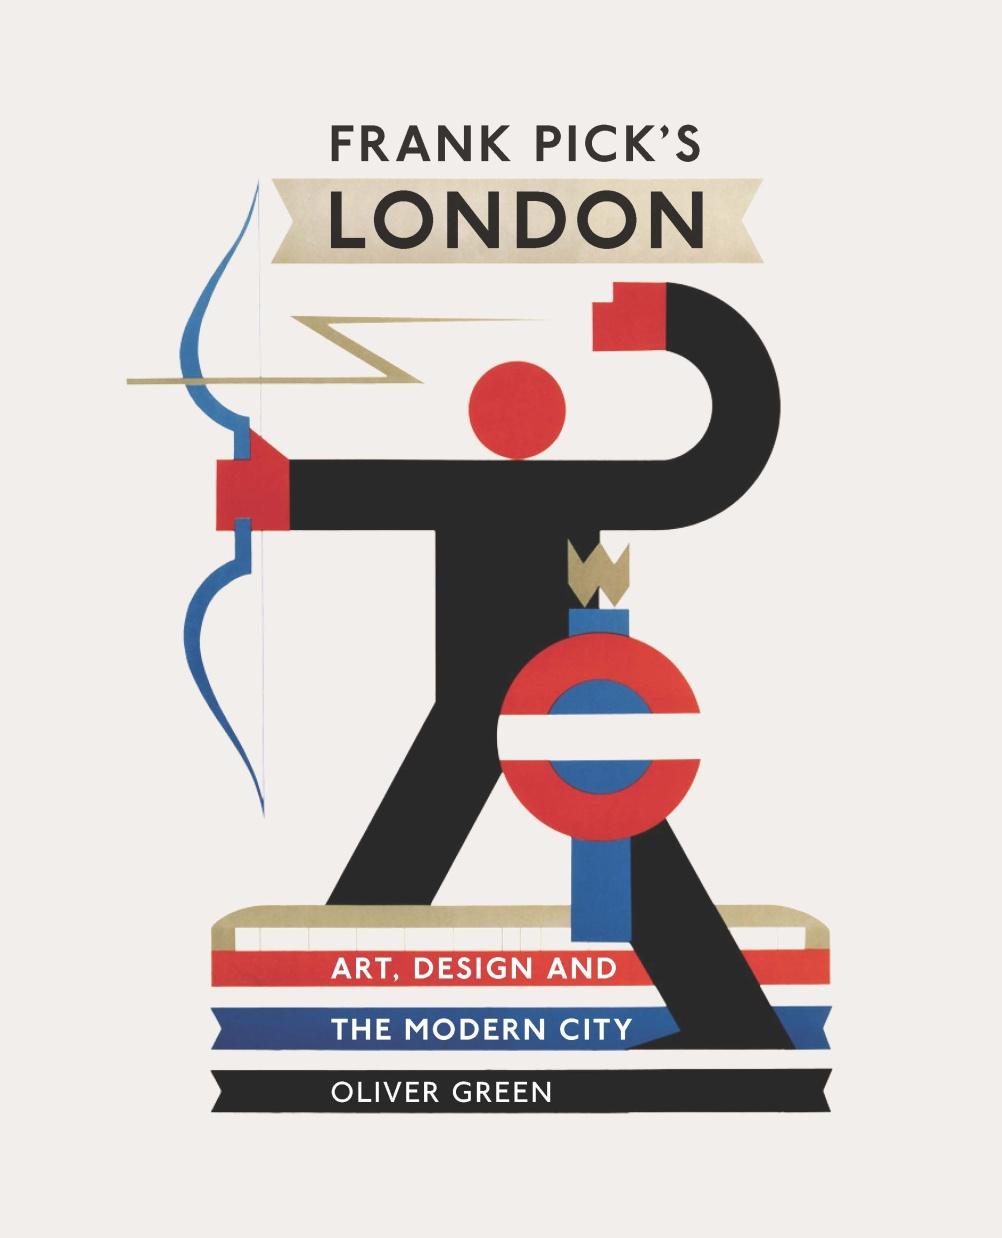 Frank Pick's London